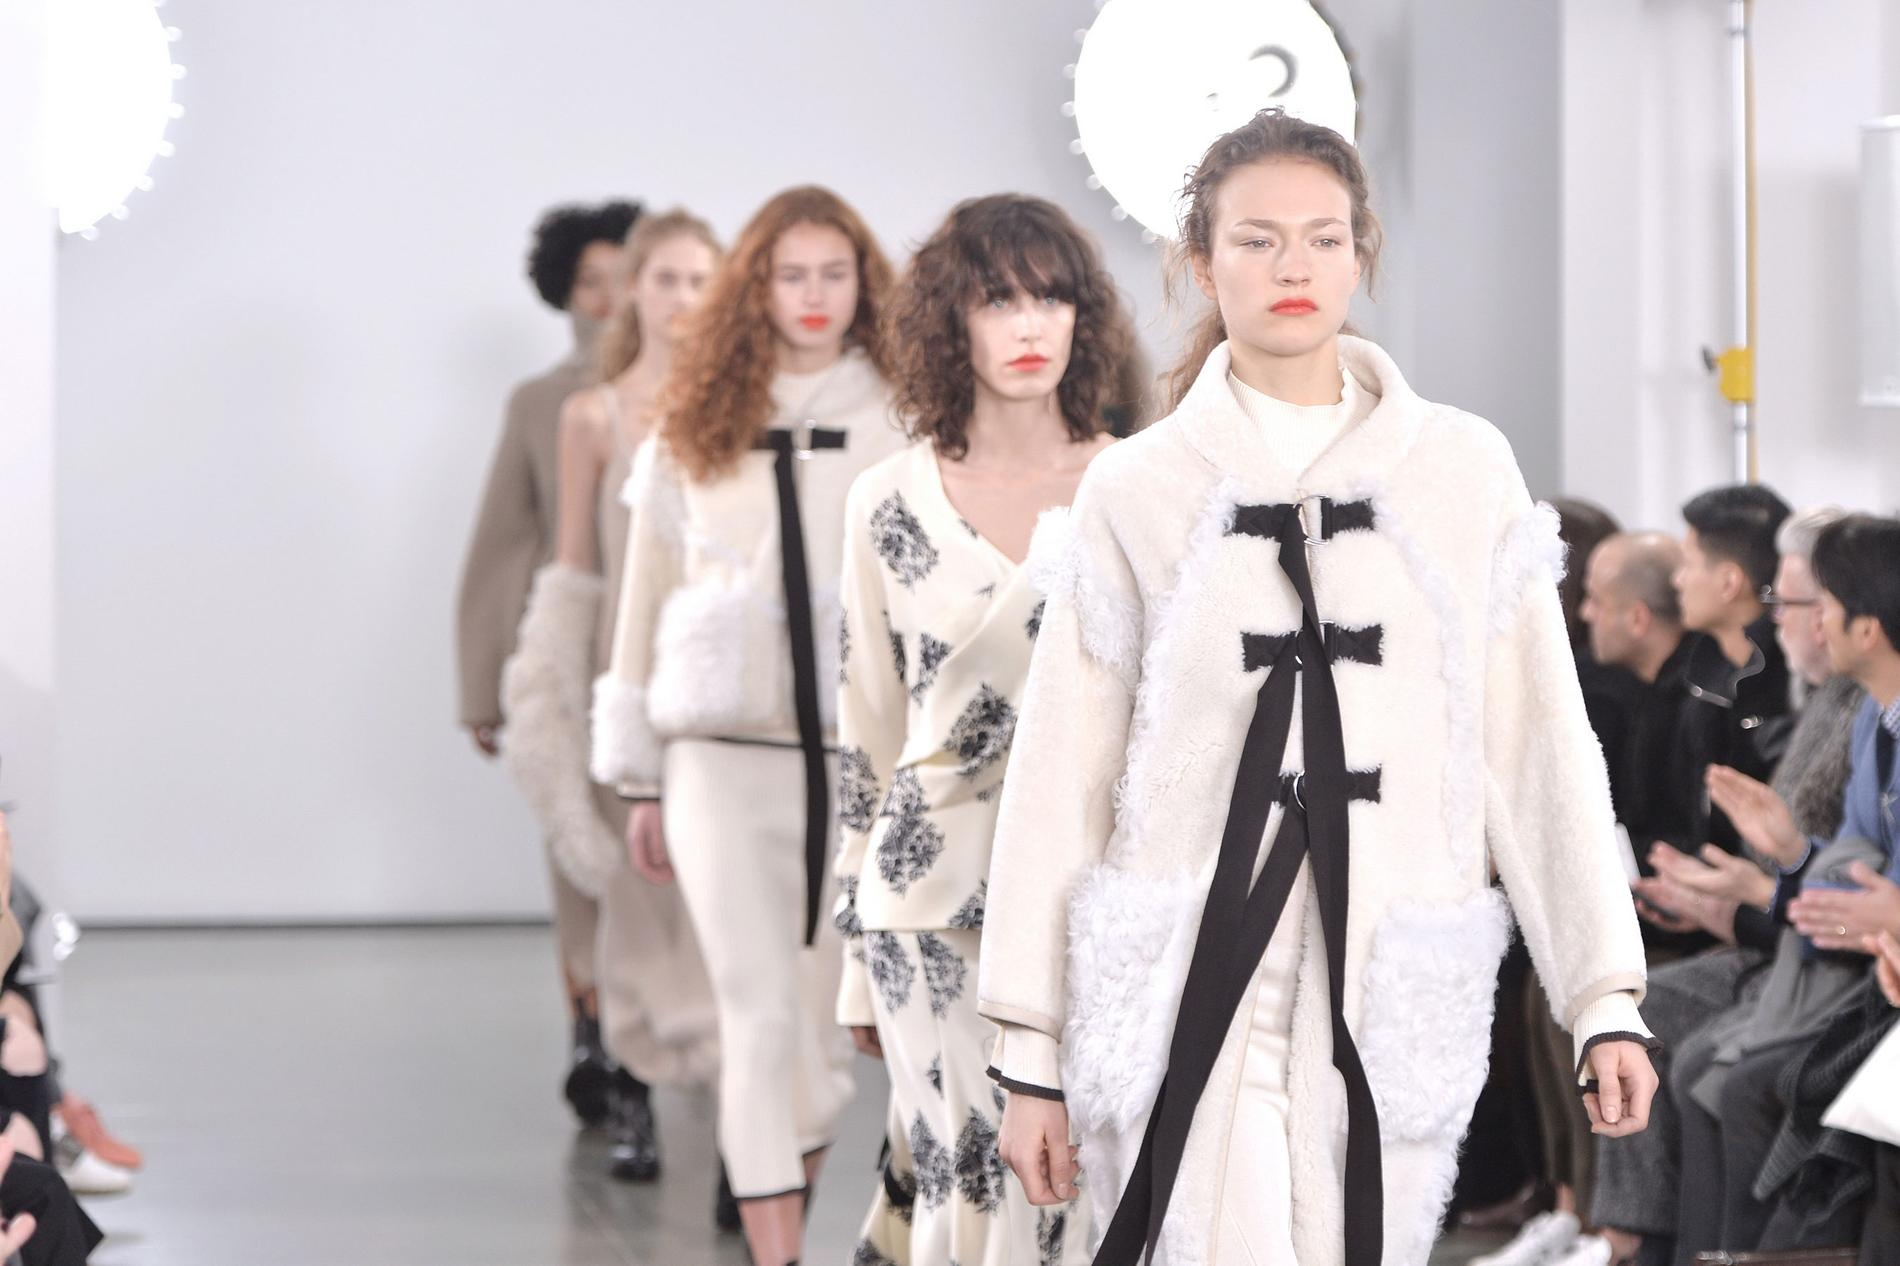 London Fashion Week - Pringle of Scotland